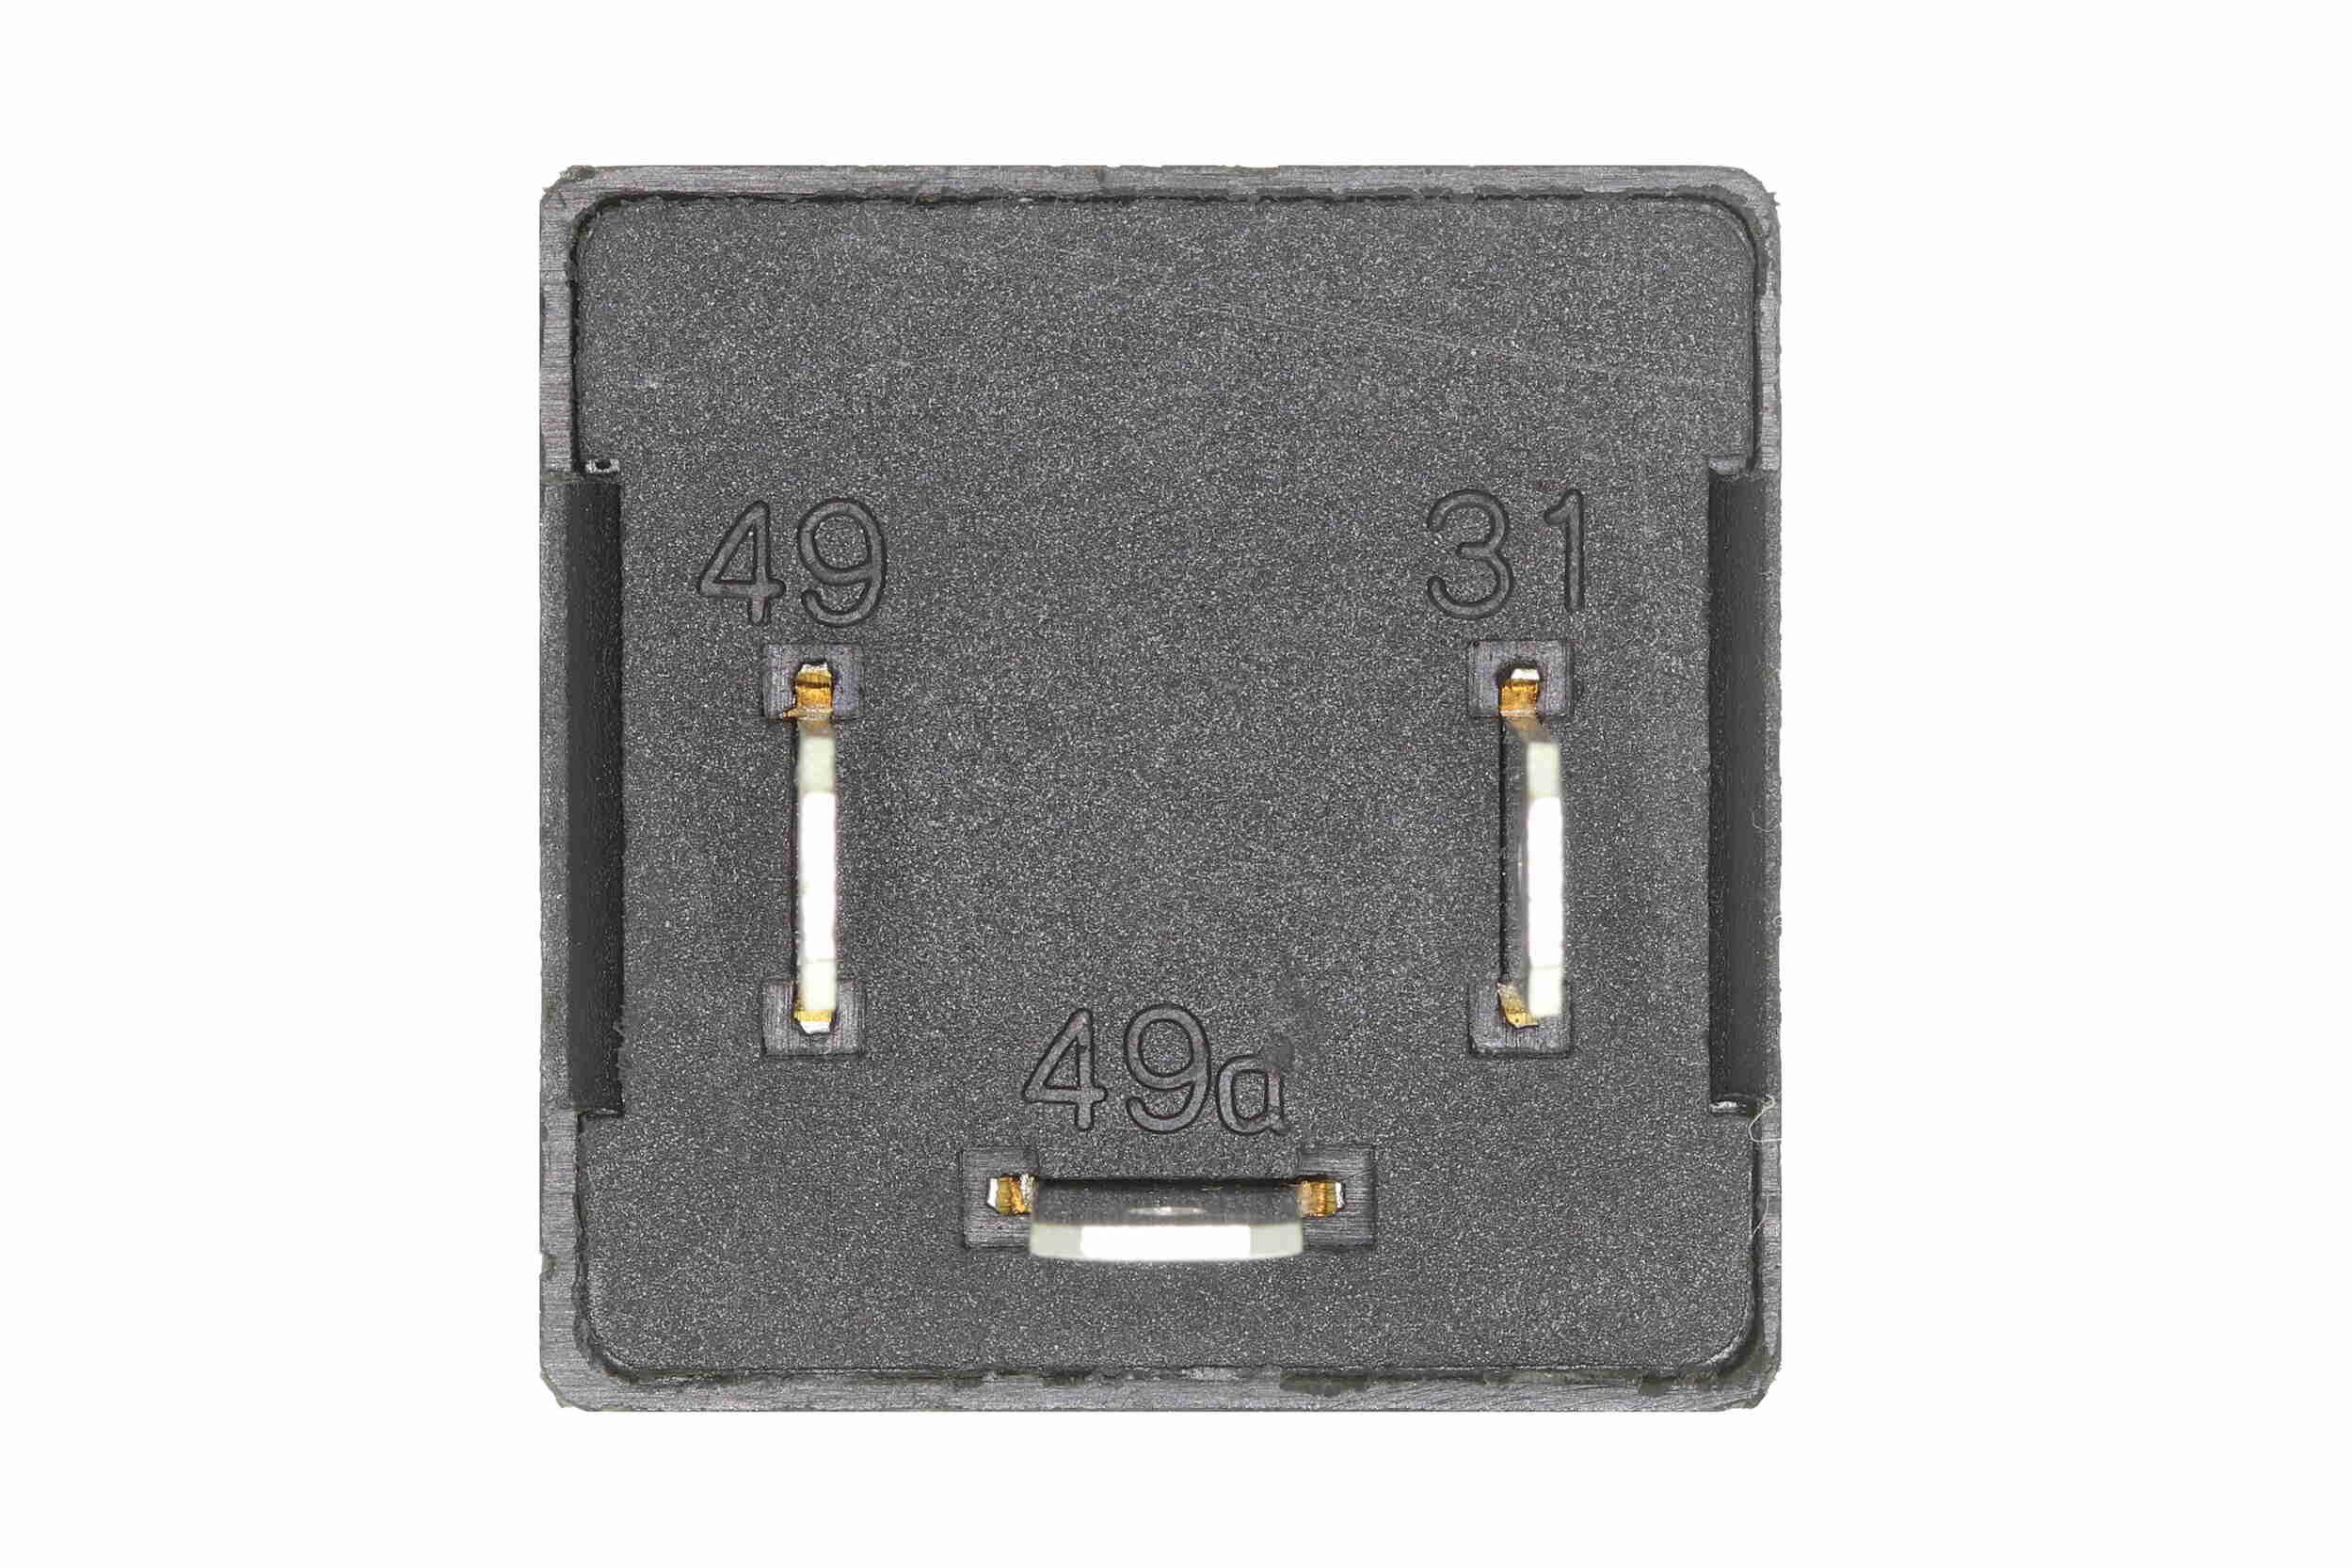 Flasher Unit VEMO V15-71-0011 rating